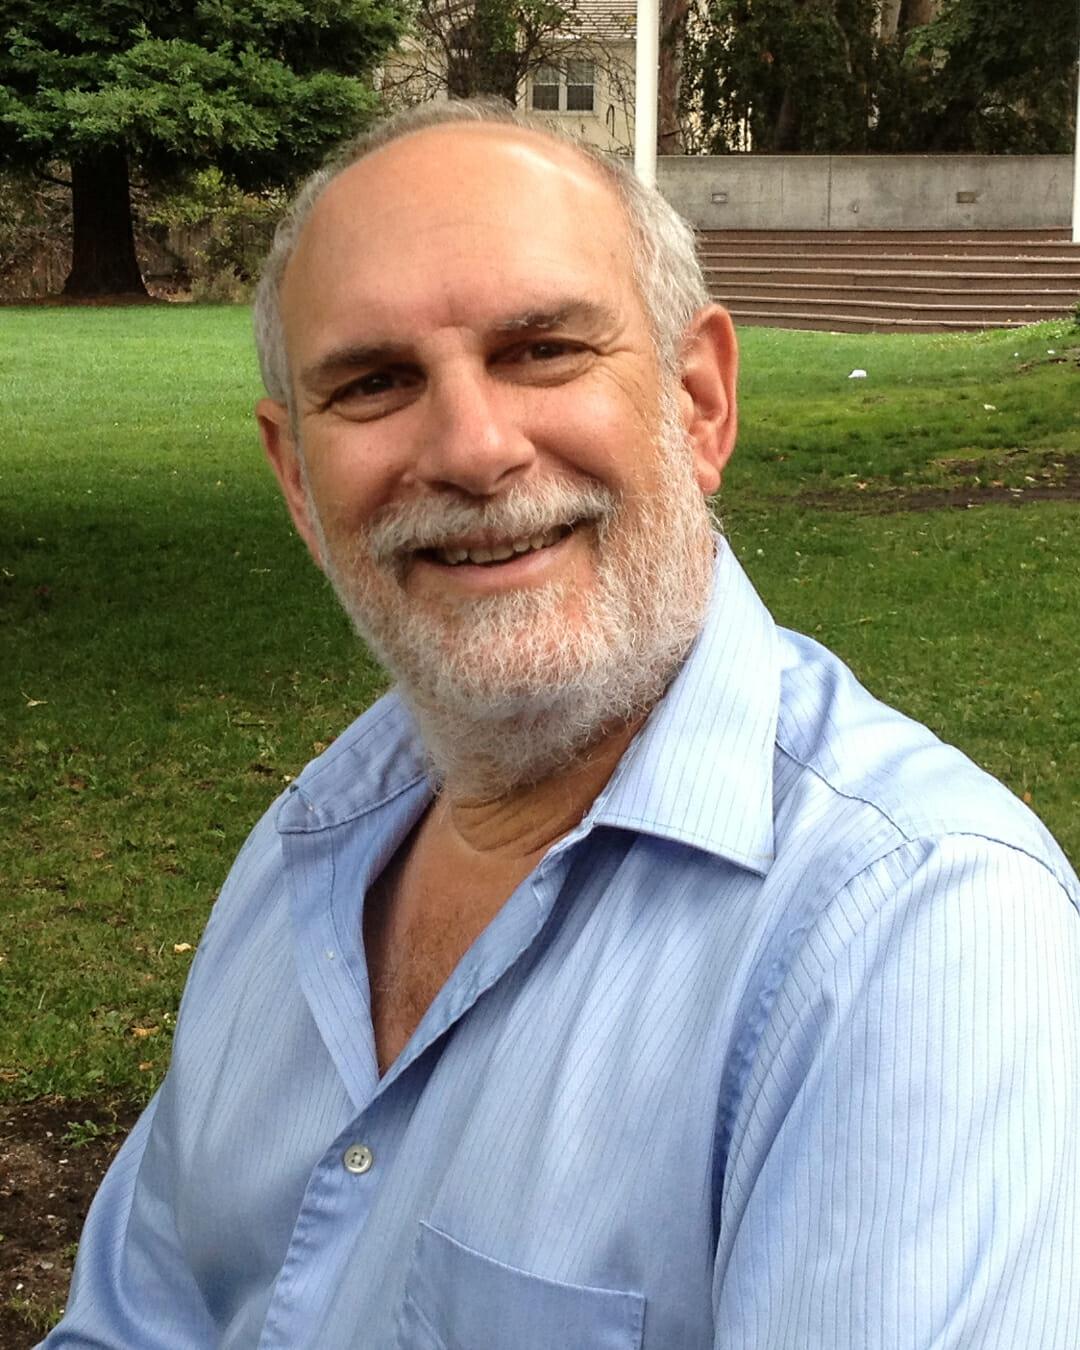 Alan Sarver, SUHSD School Board President